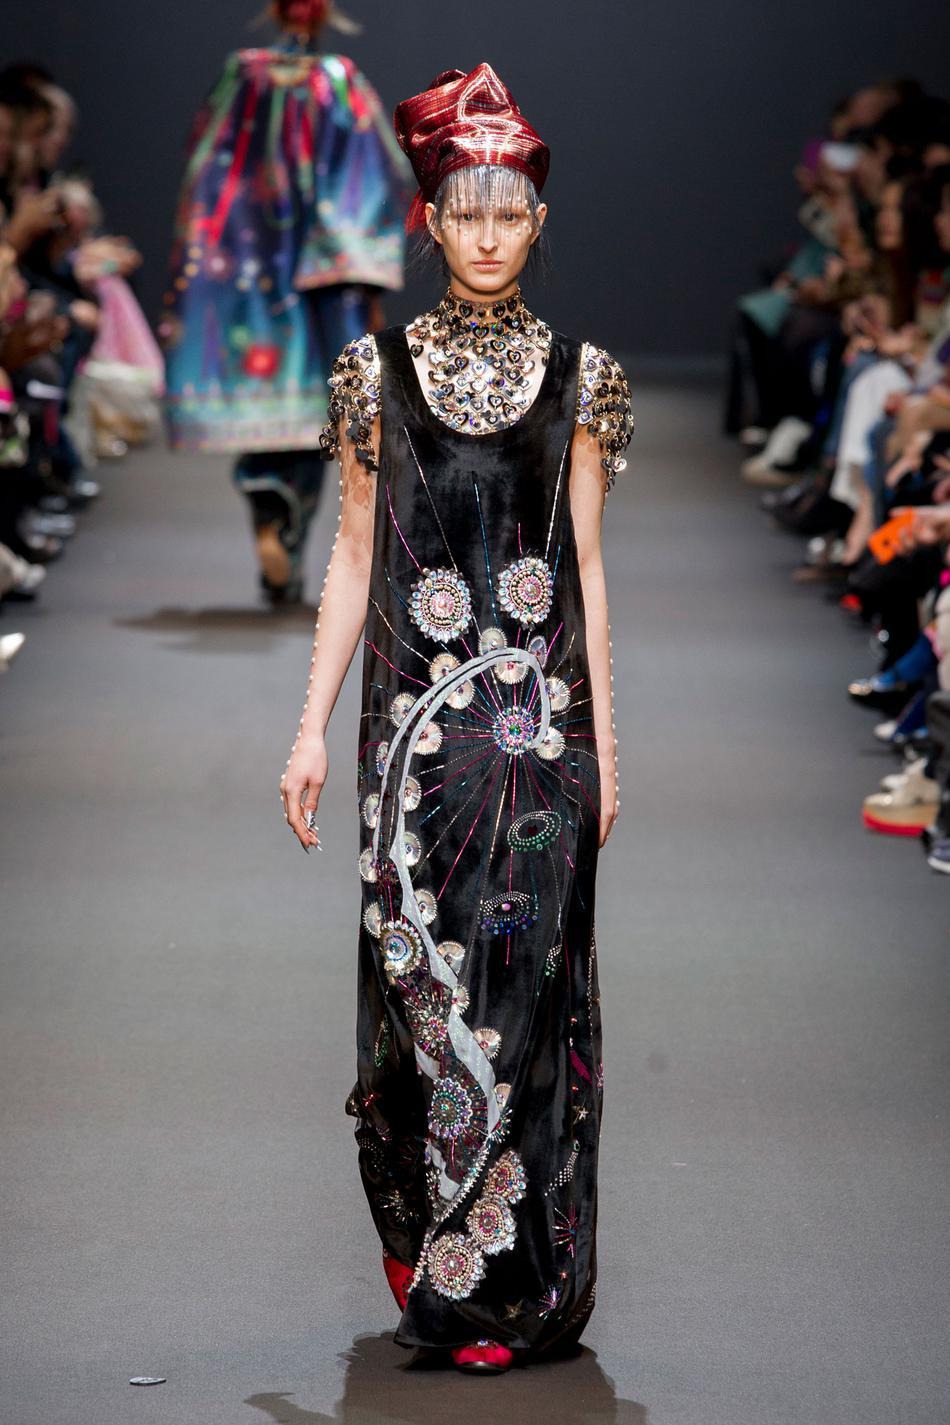 Défilé Manish Arora Fashion Week 2017 - Look 36-1